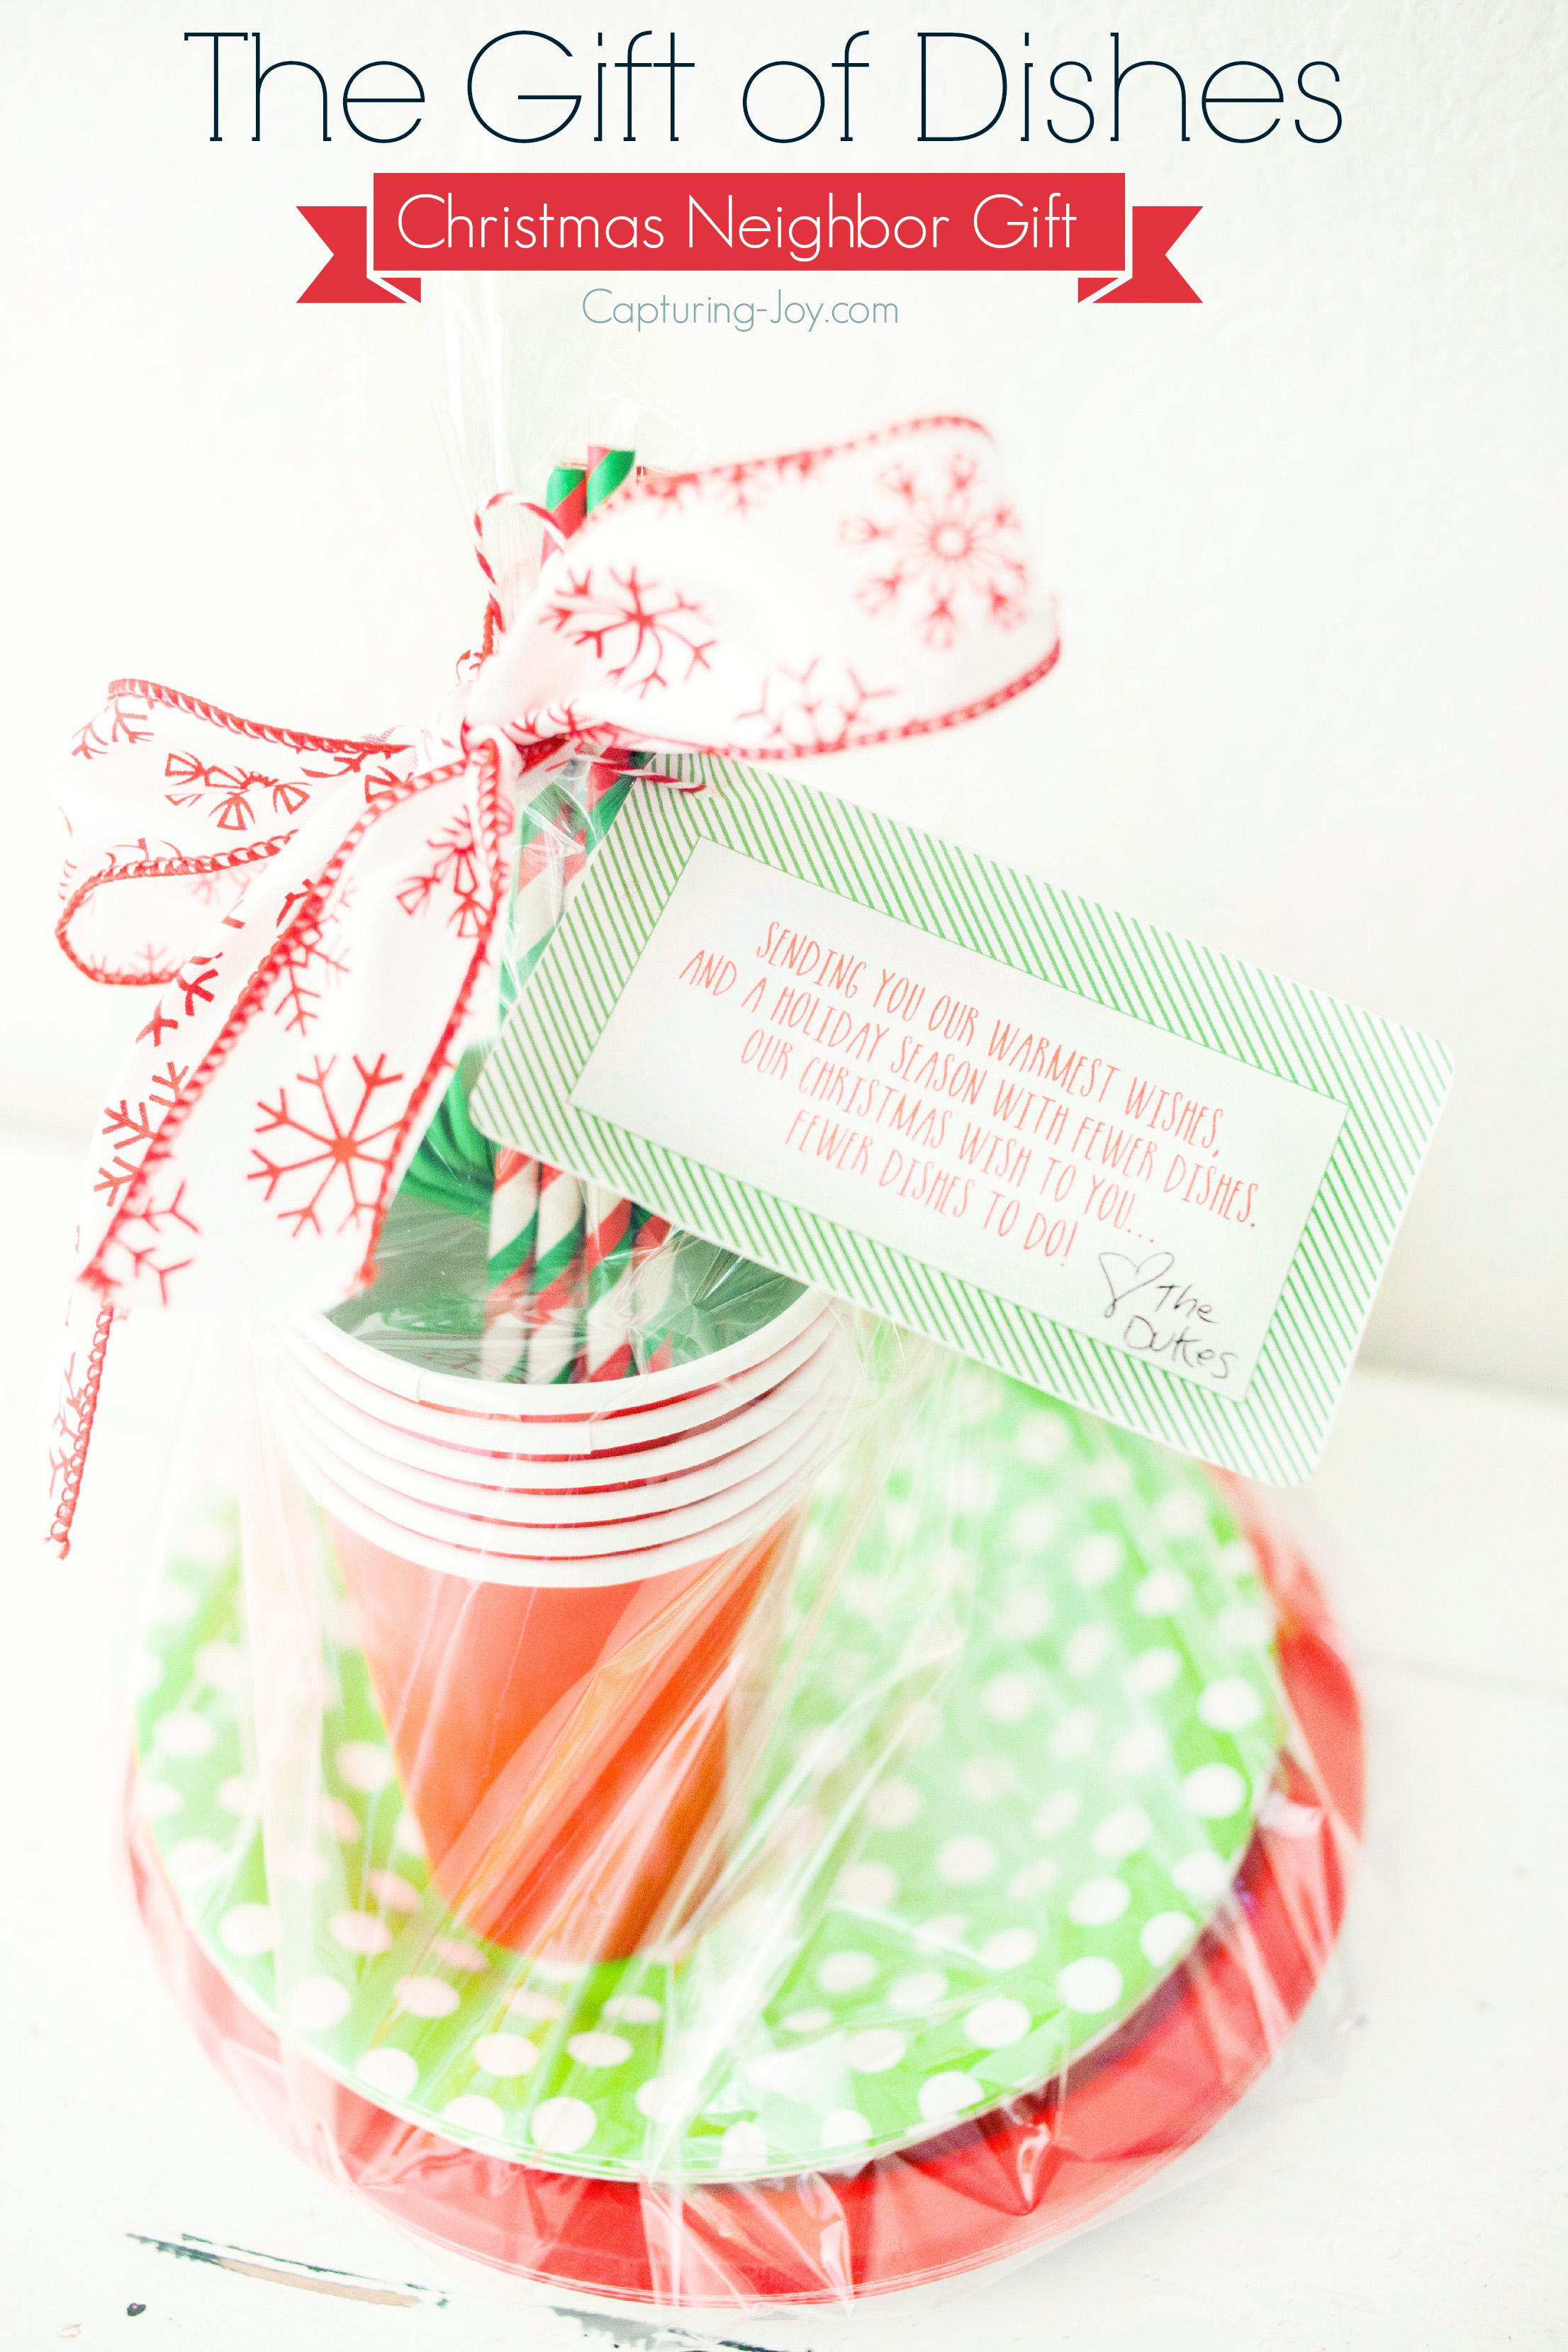 The Gift Of Dishes Christmas Neighbor Gift